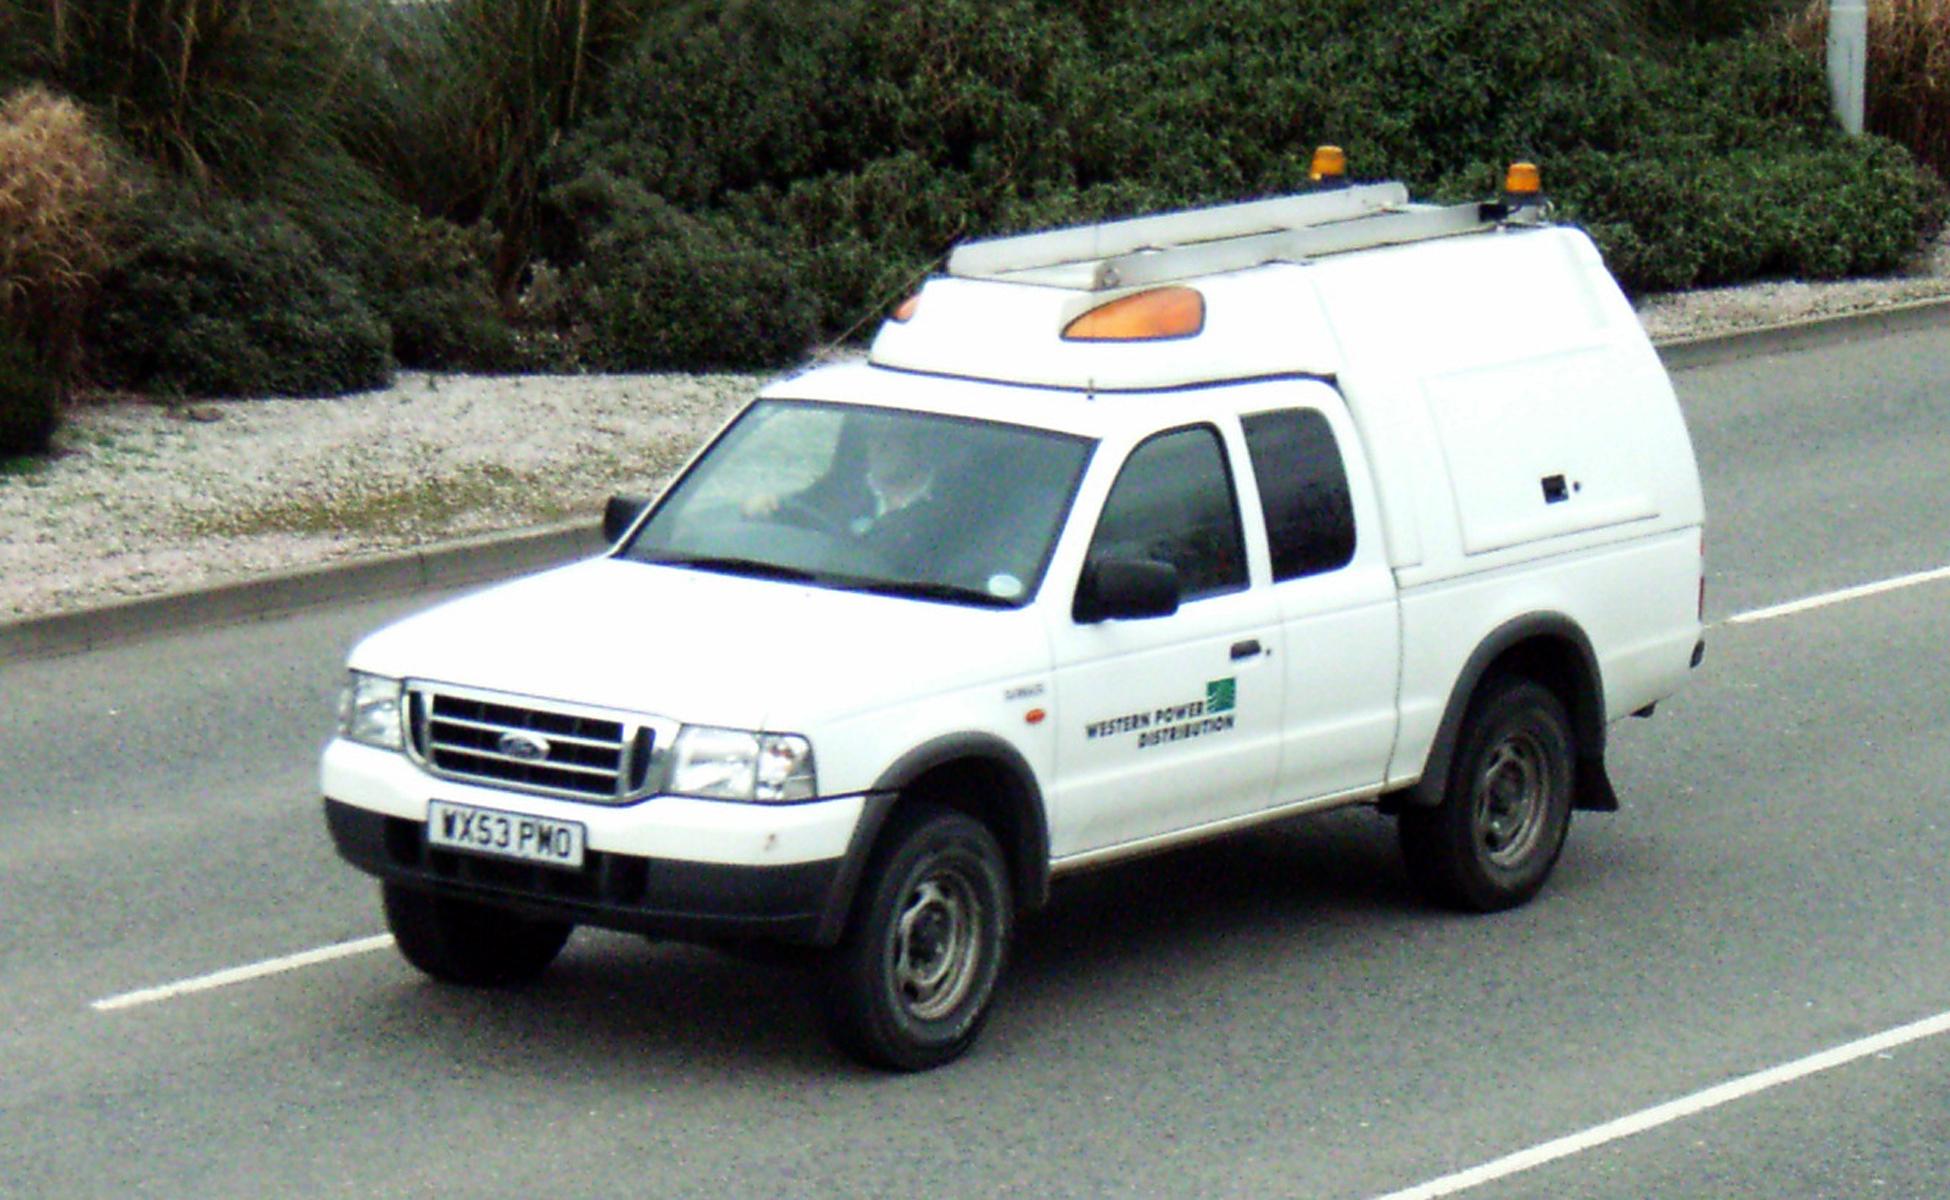 2004 ford ranger xlt fx4 level ii extended cab pickup 4 0l v6 4x4 rh carspecs us 2004 ford ranger manual book 2004 ford ranger manual book